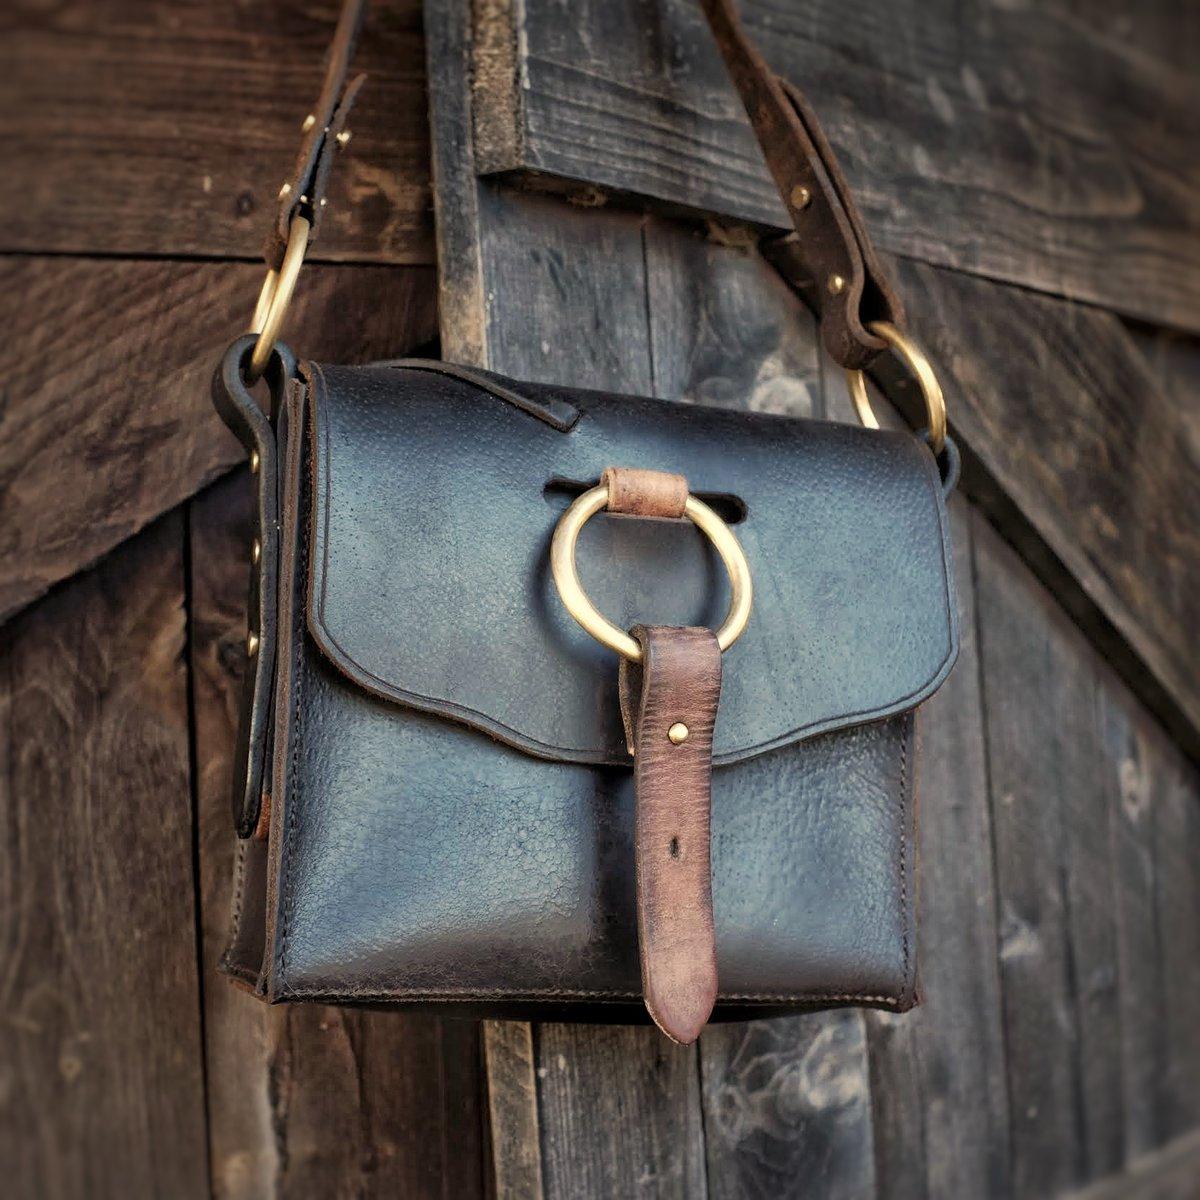 Image of Antique Saddle Bag